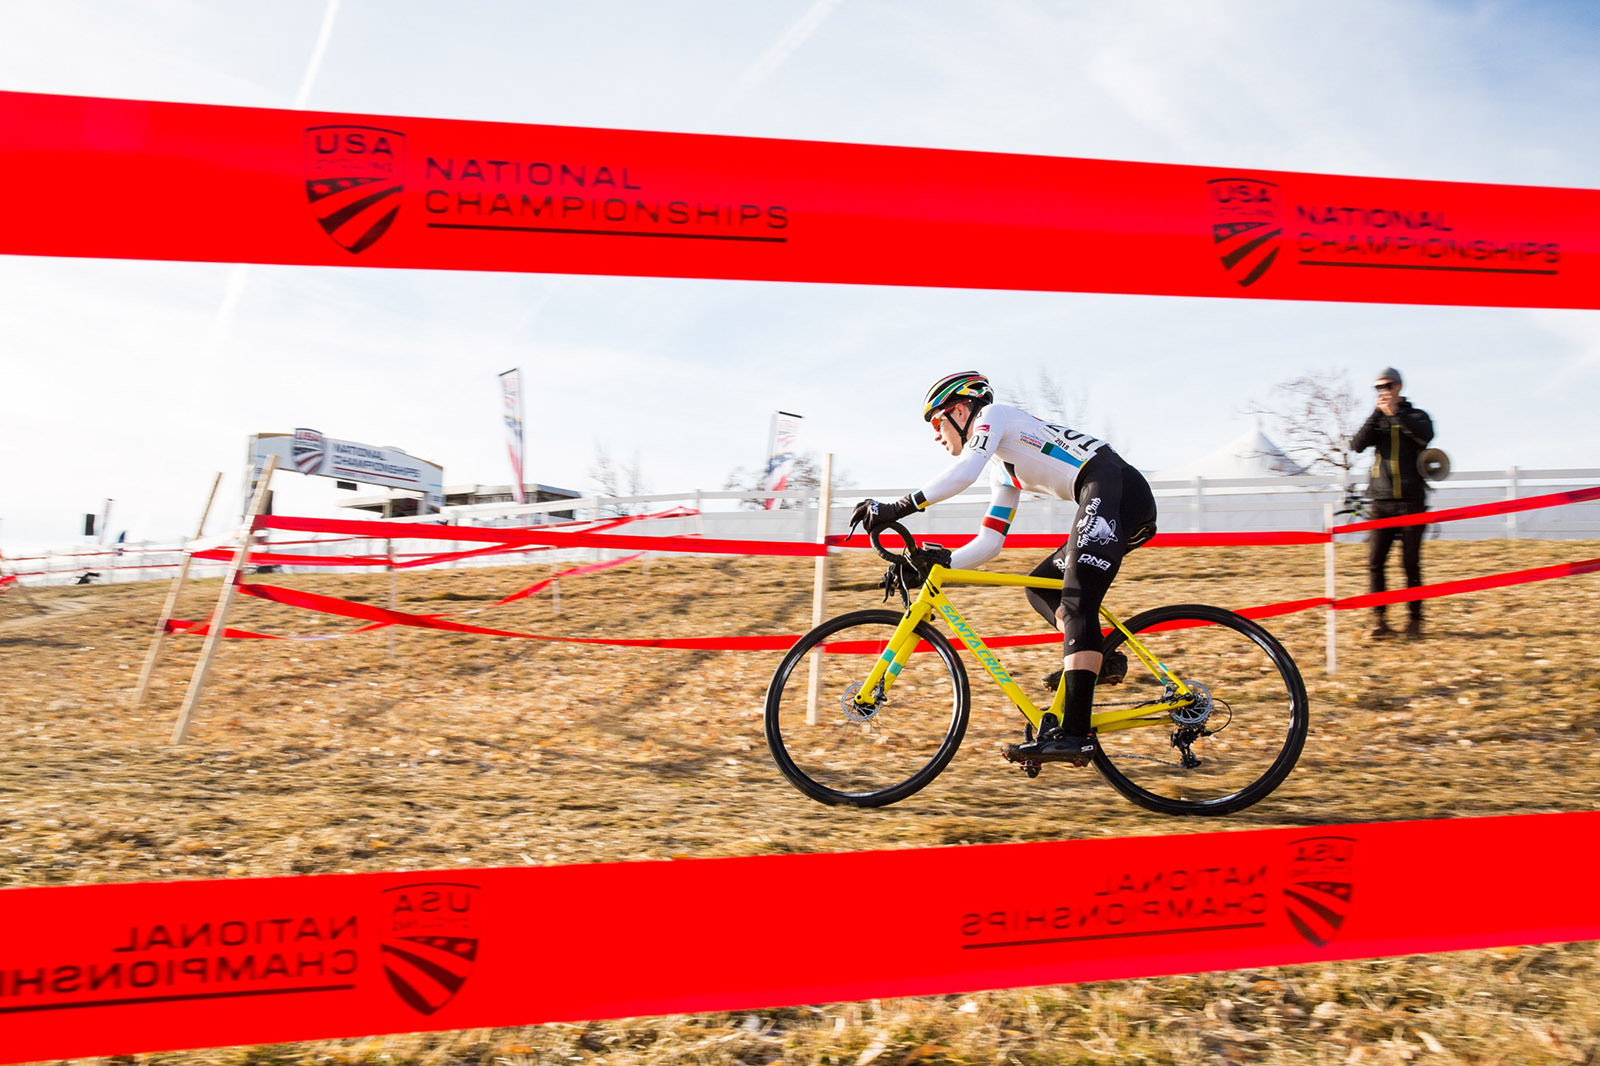 Ben Gomez Villafane - Santa Cruz Bicycles - Cyclocross National Championships